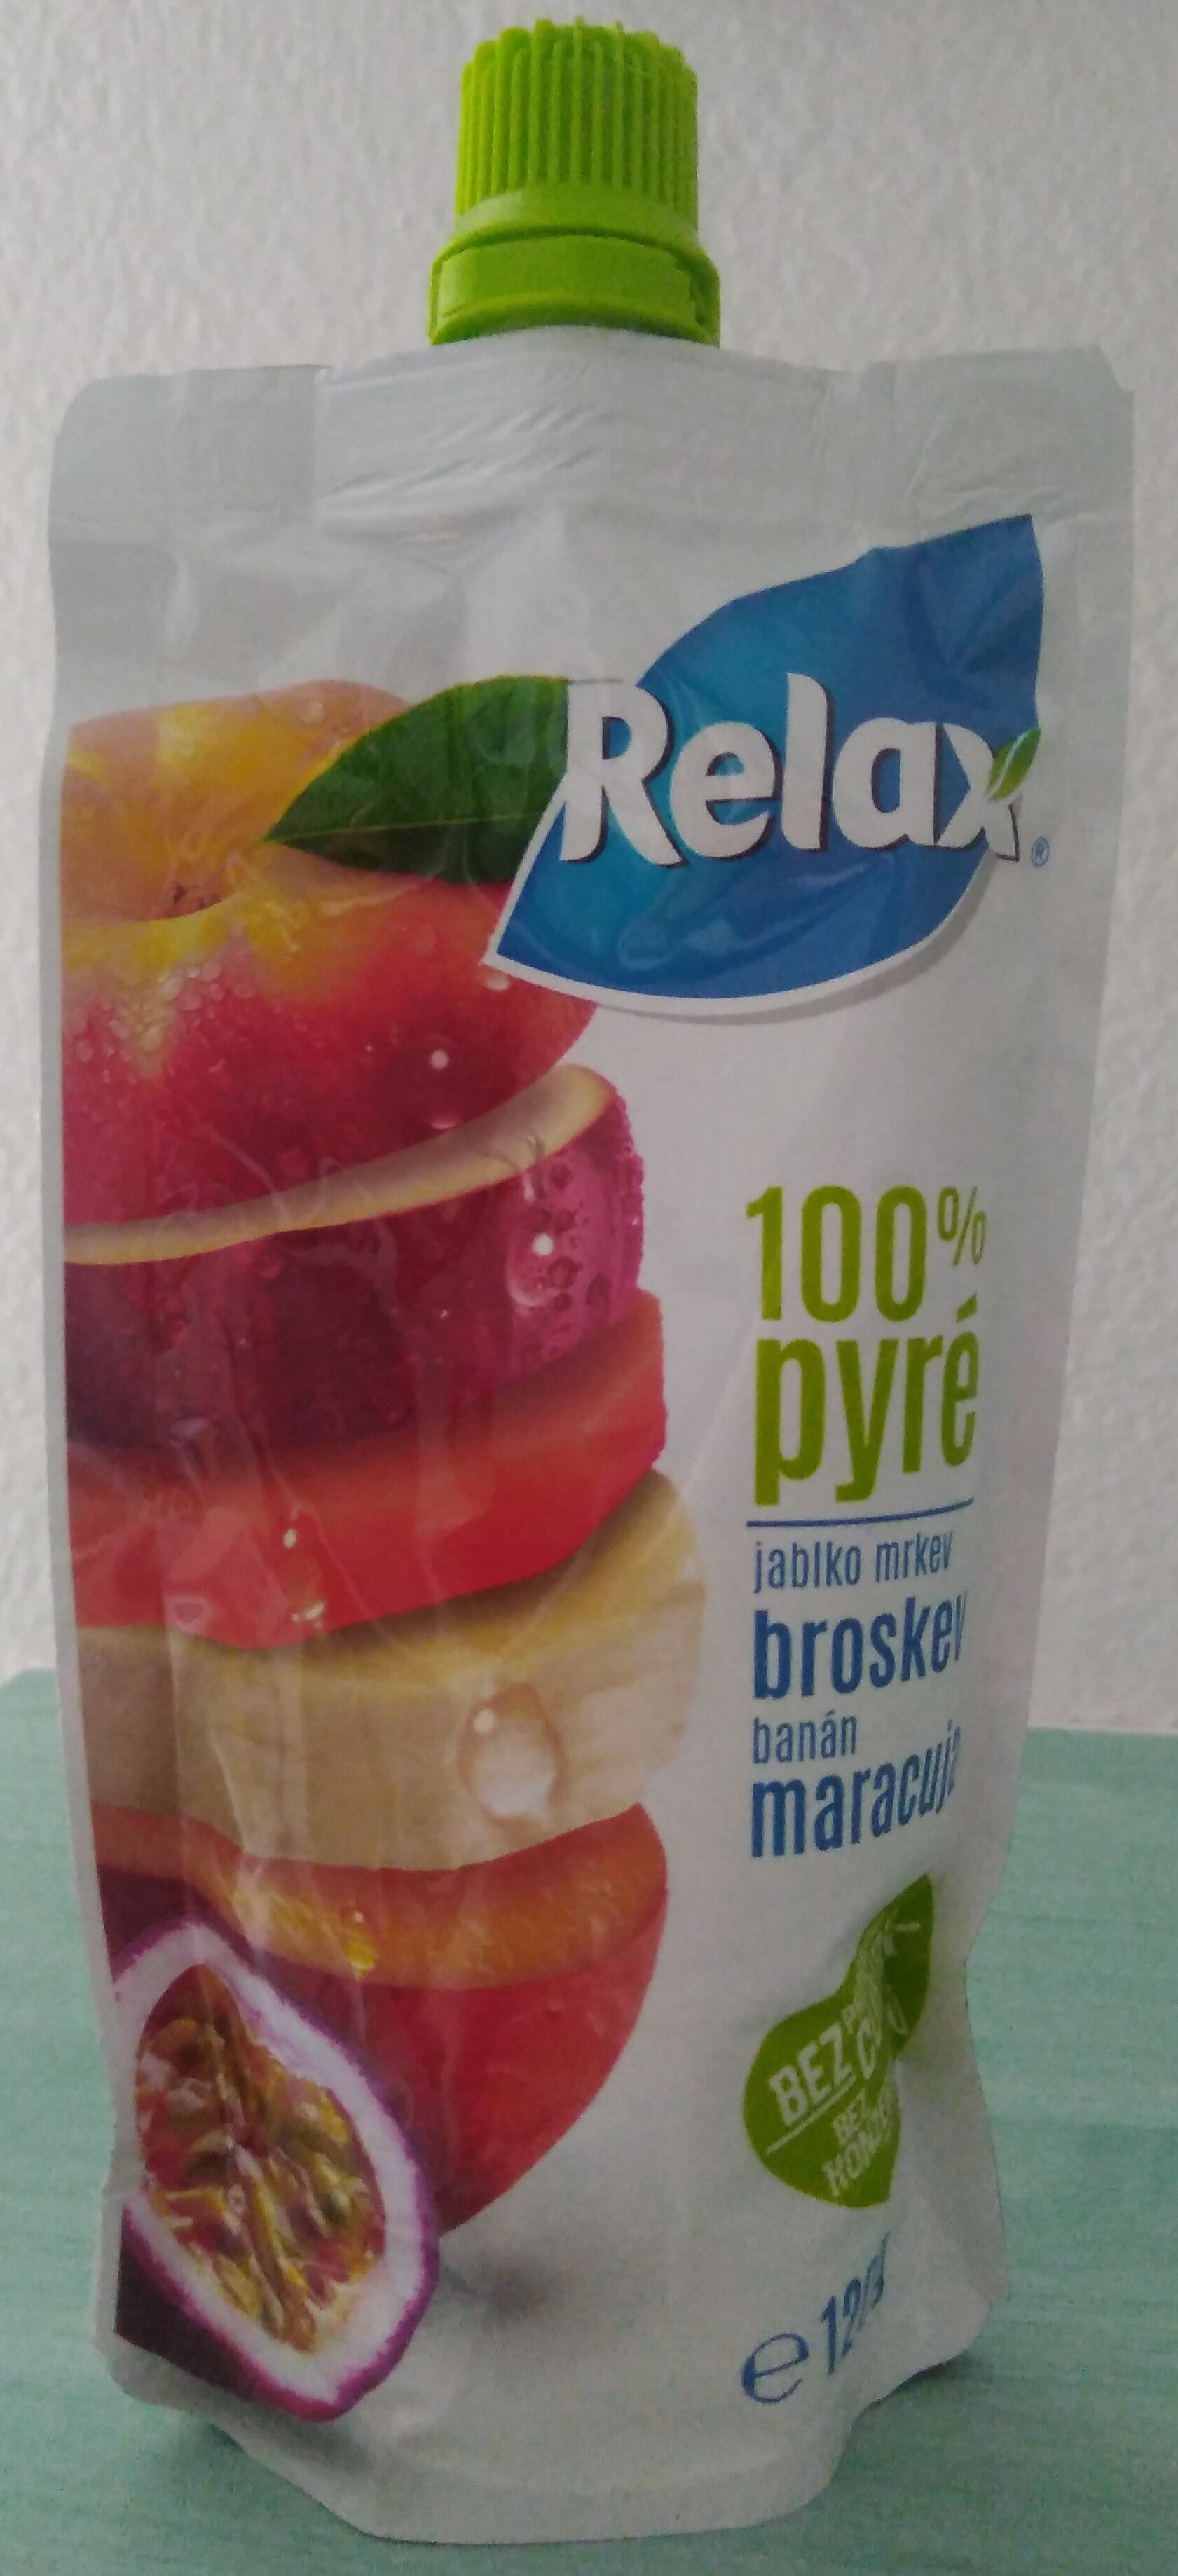 100% pyré - jablko, mrkev, broskev, banán, maracuja - Product - cs